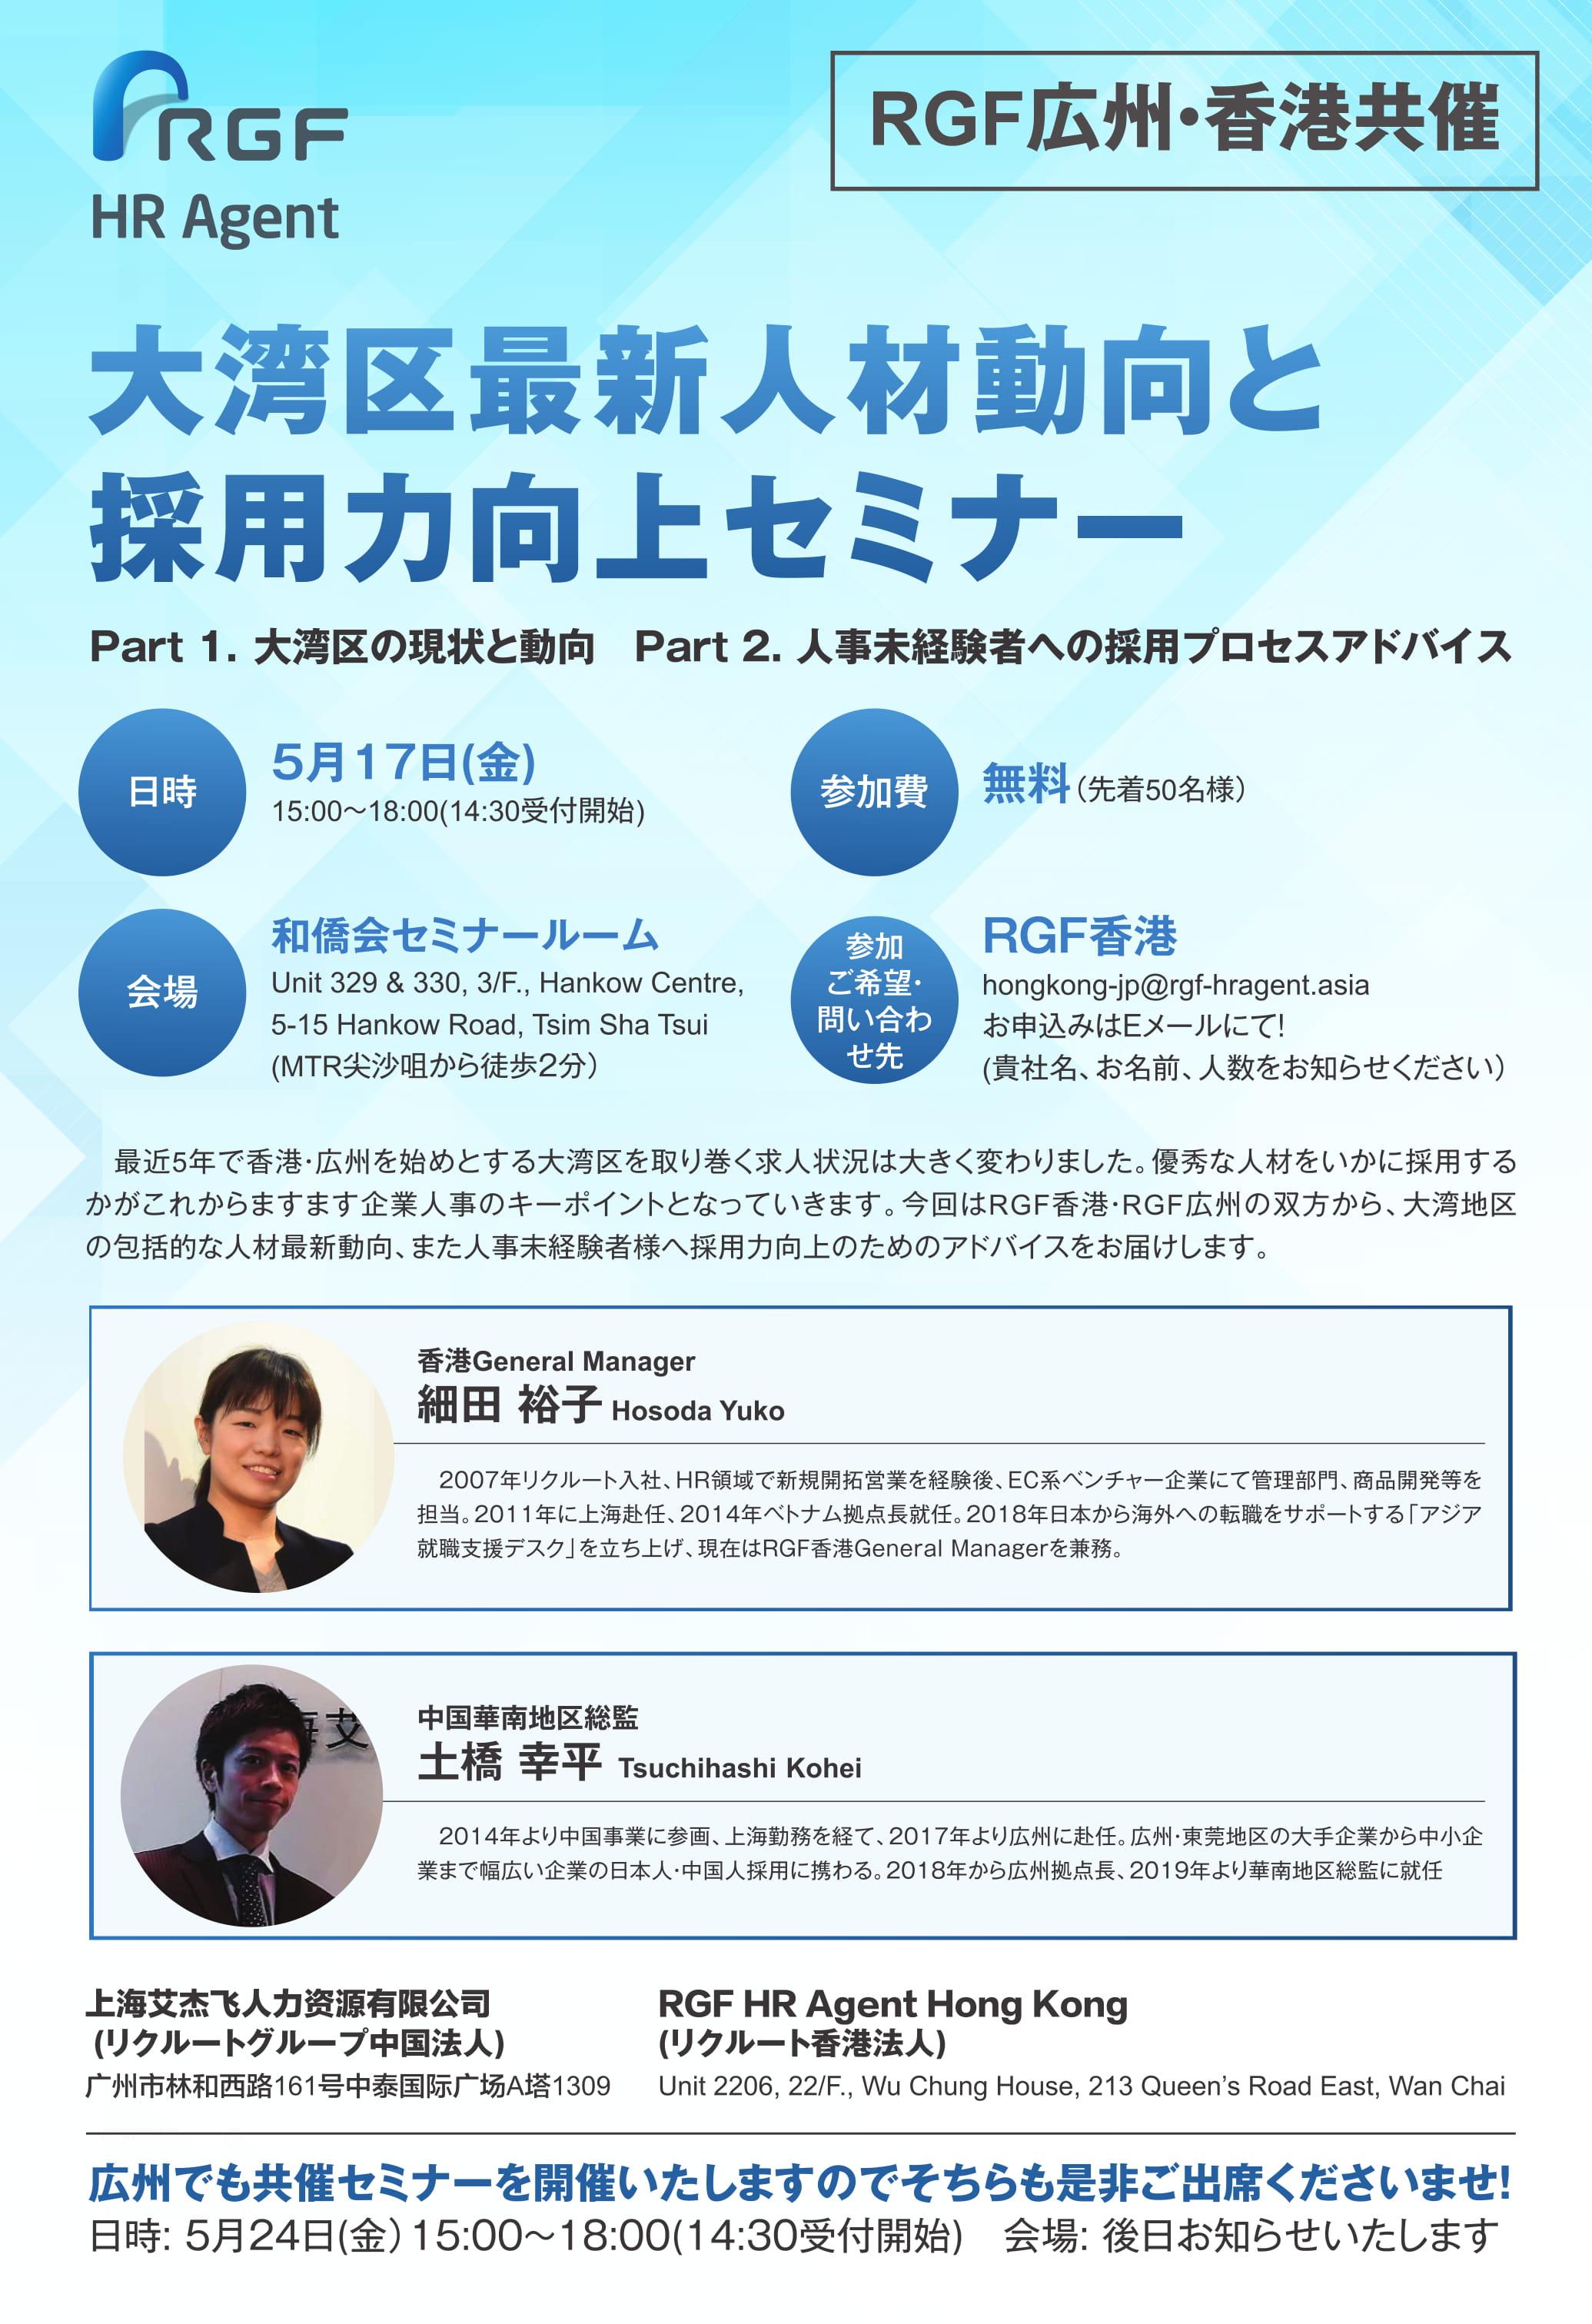 RGF2019年5月17日セミナー案内ポスター.jpg